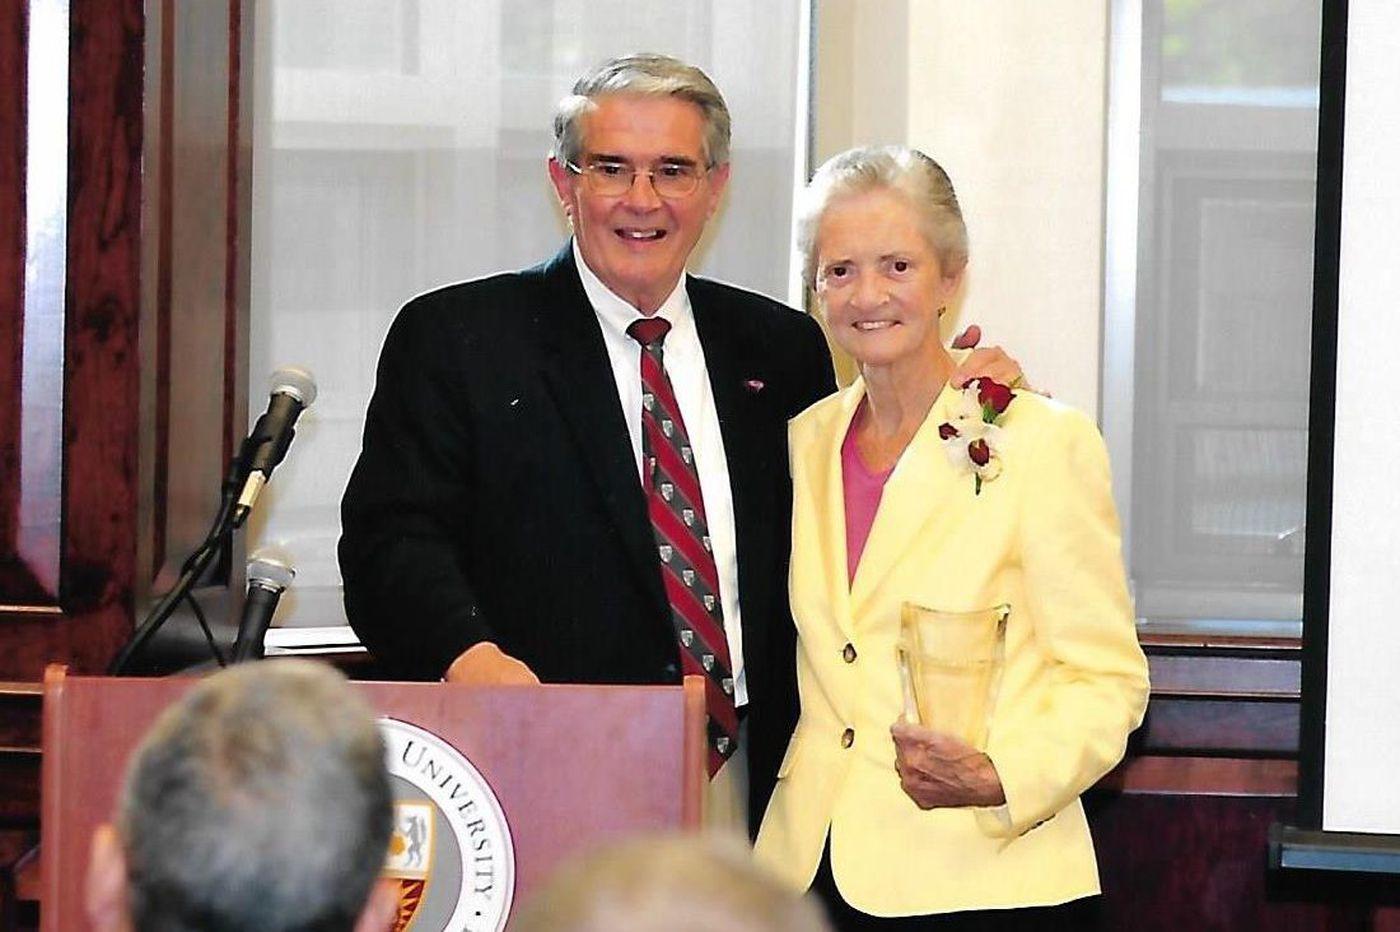 Ellen Ryan, 78, built St. Joseph's women's sports program